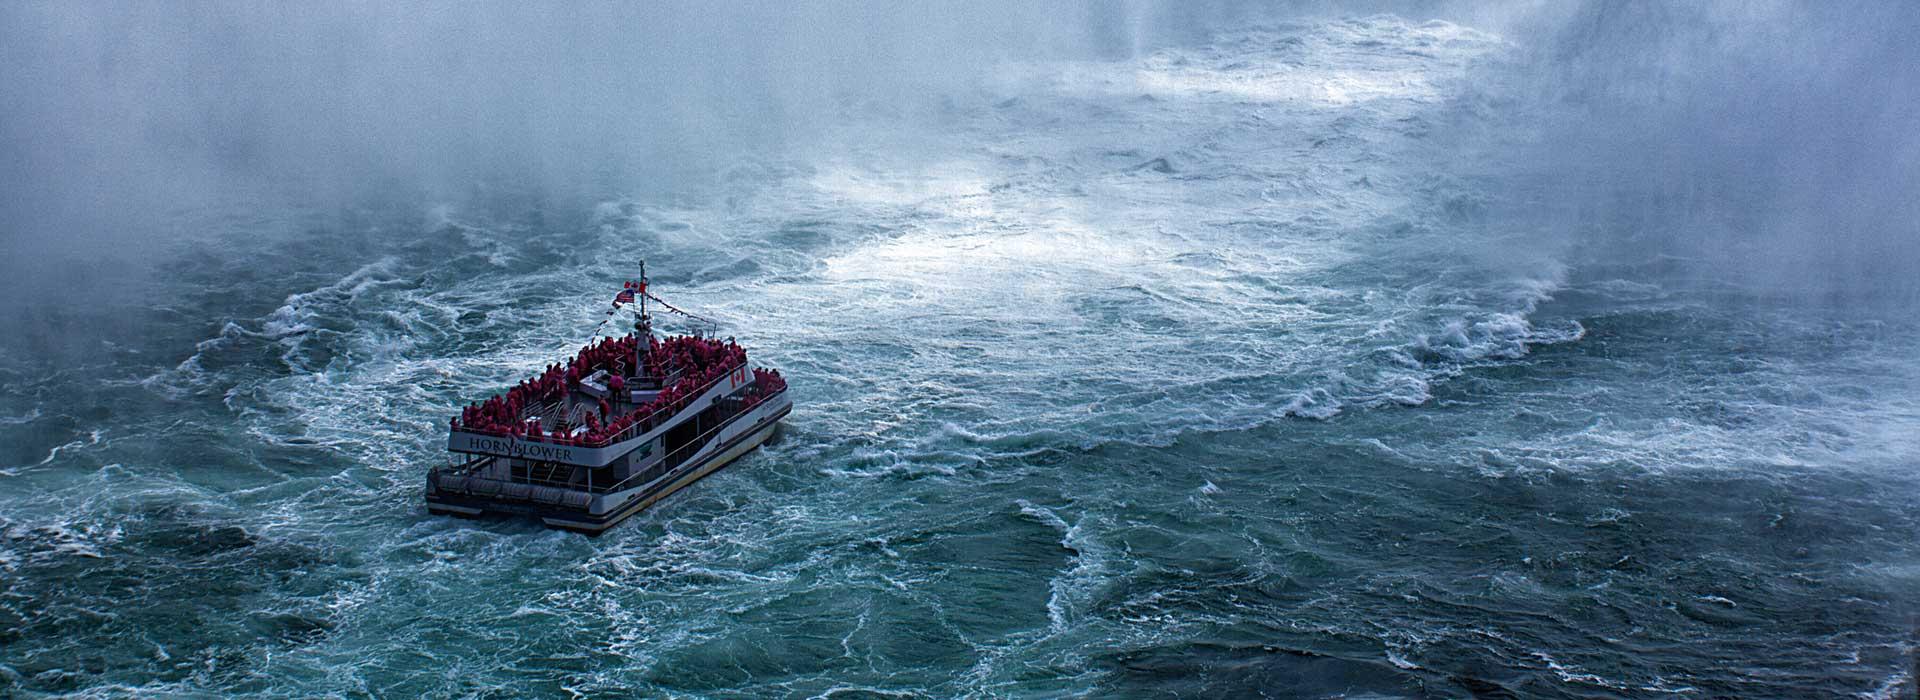 Niagara Falls Boat Tour Price Toniagara